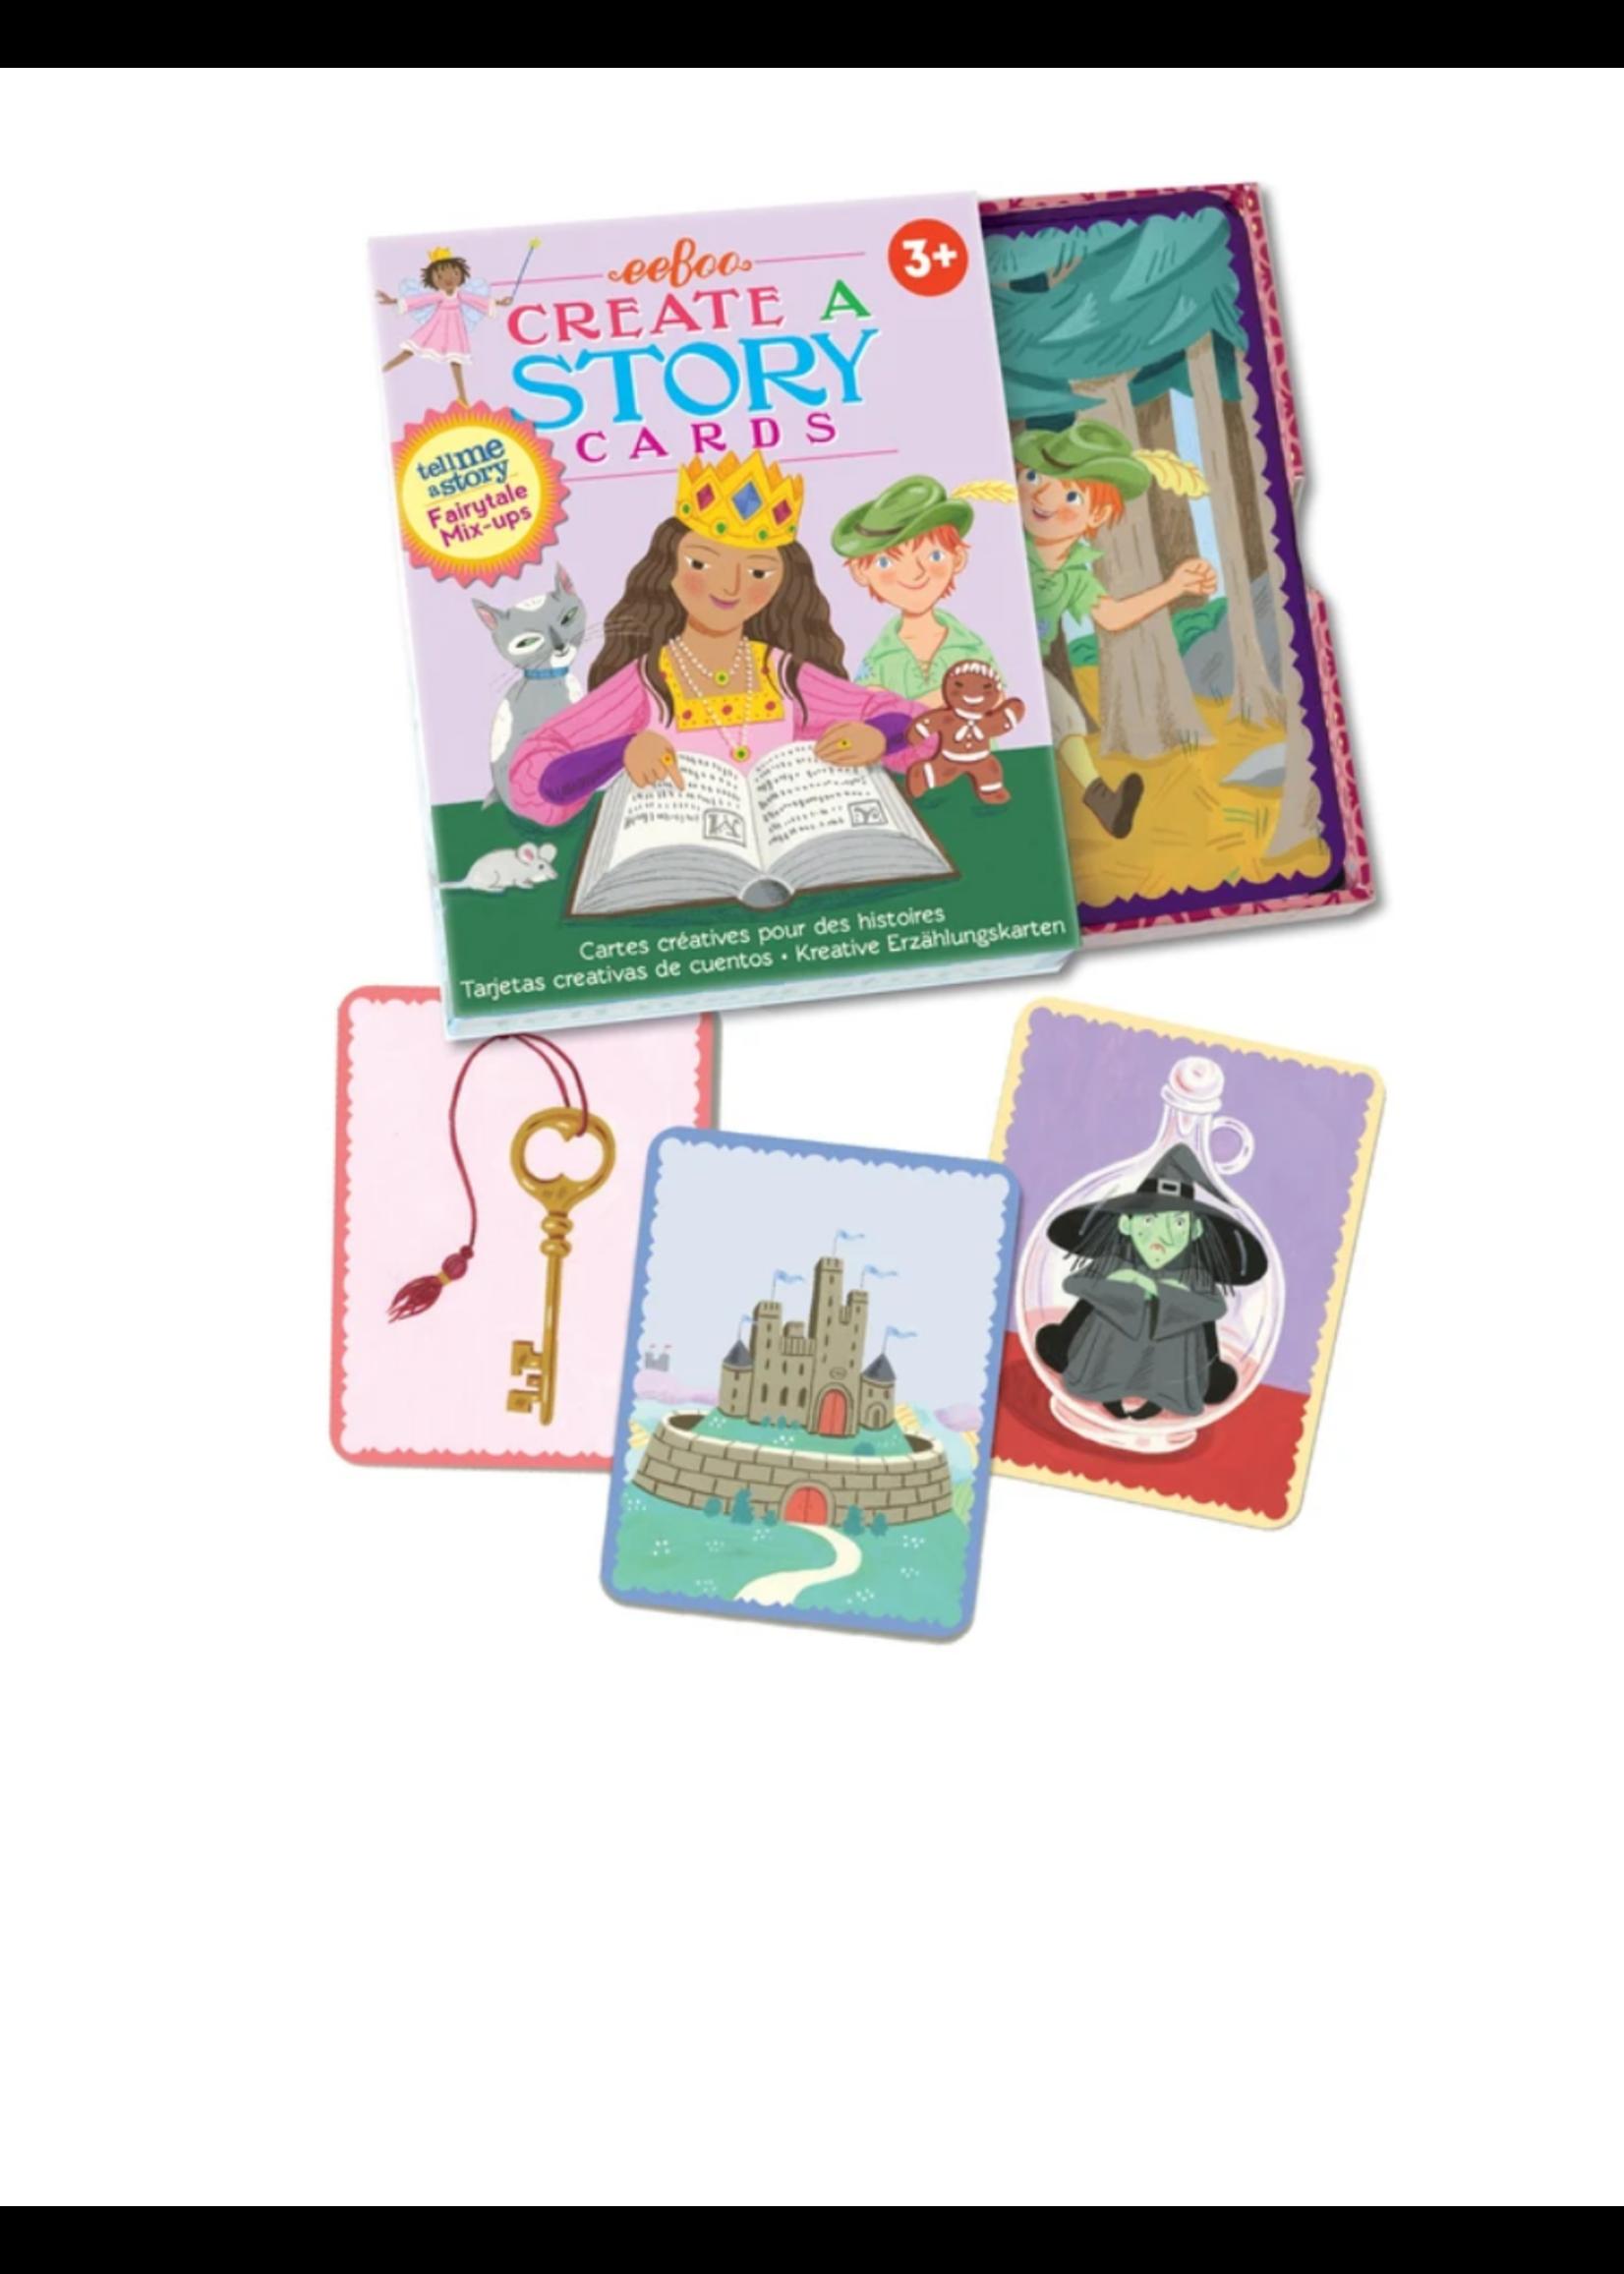 eeBoo Fairytale Mix Ups Create a Story Cards